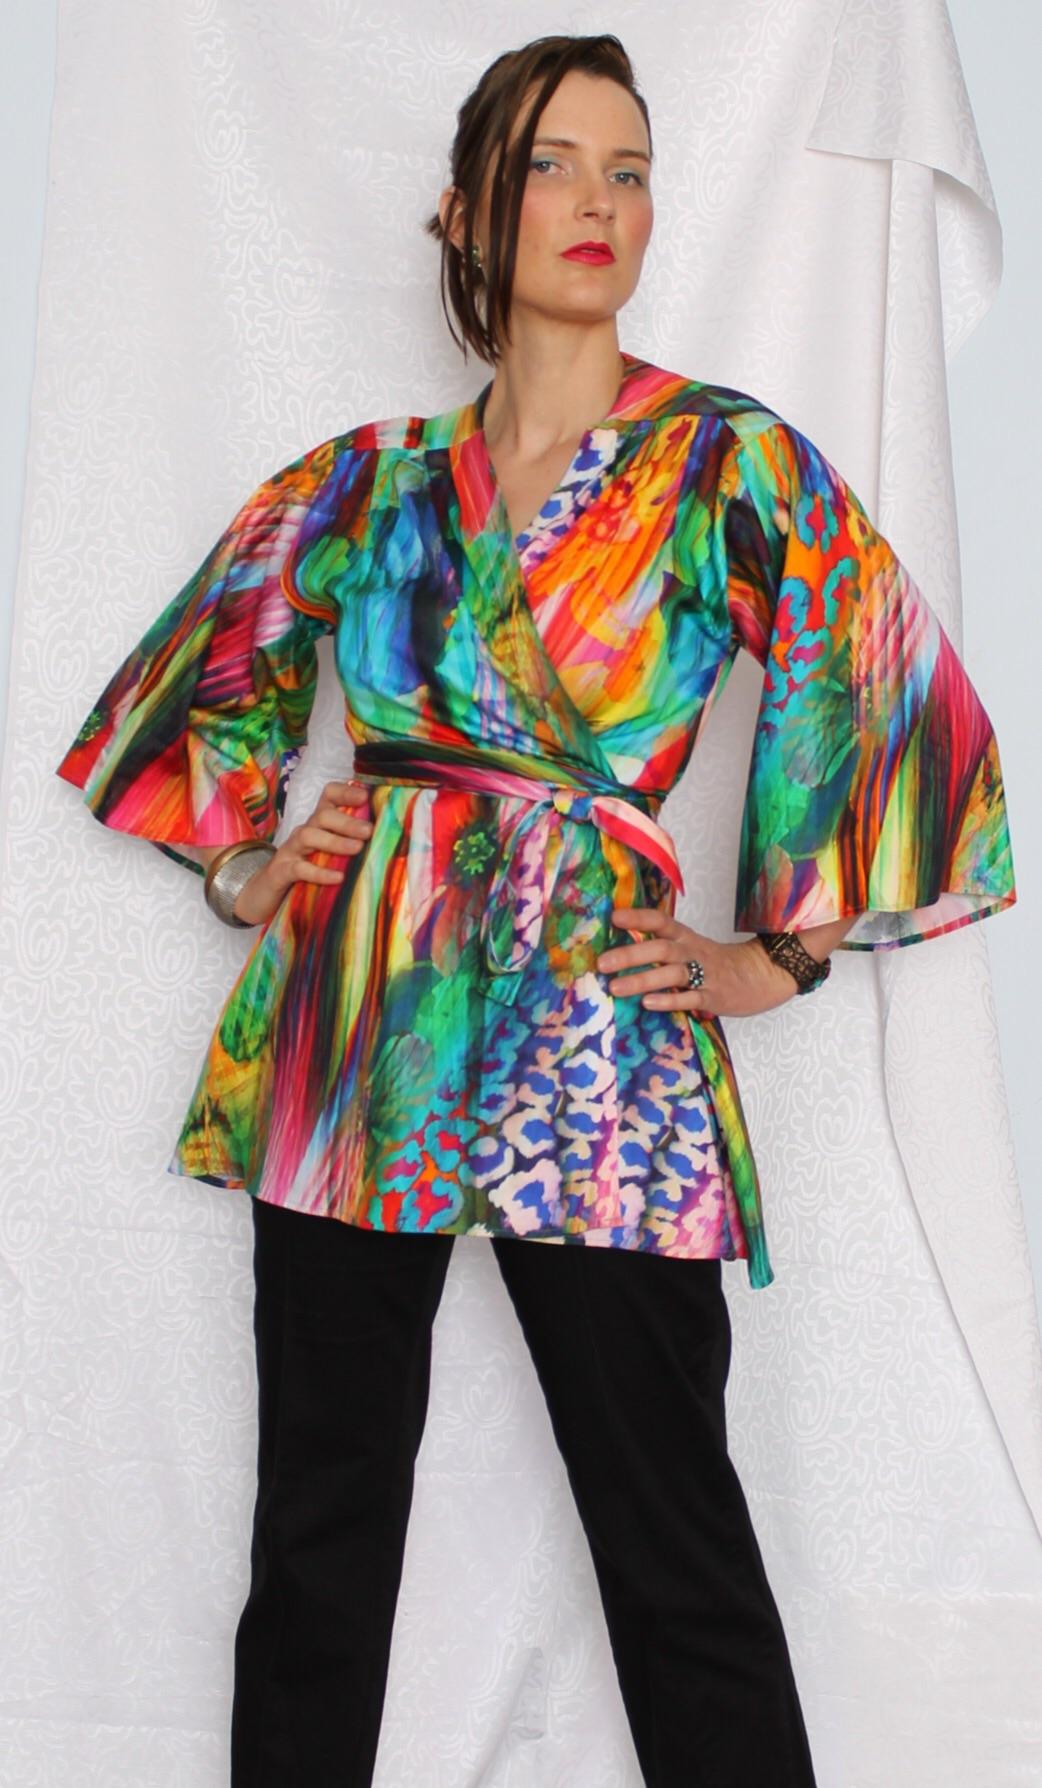 The Bright Kaleidoscope kimono worn here with black pants.